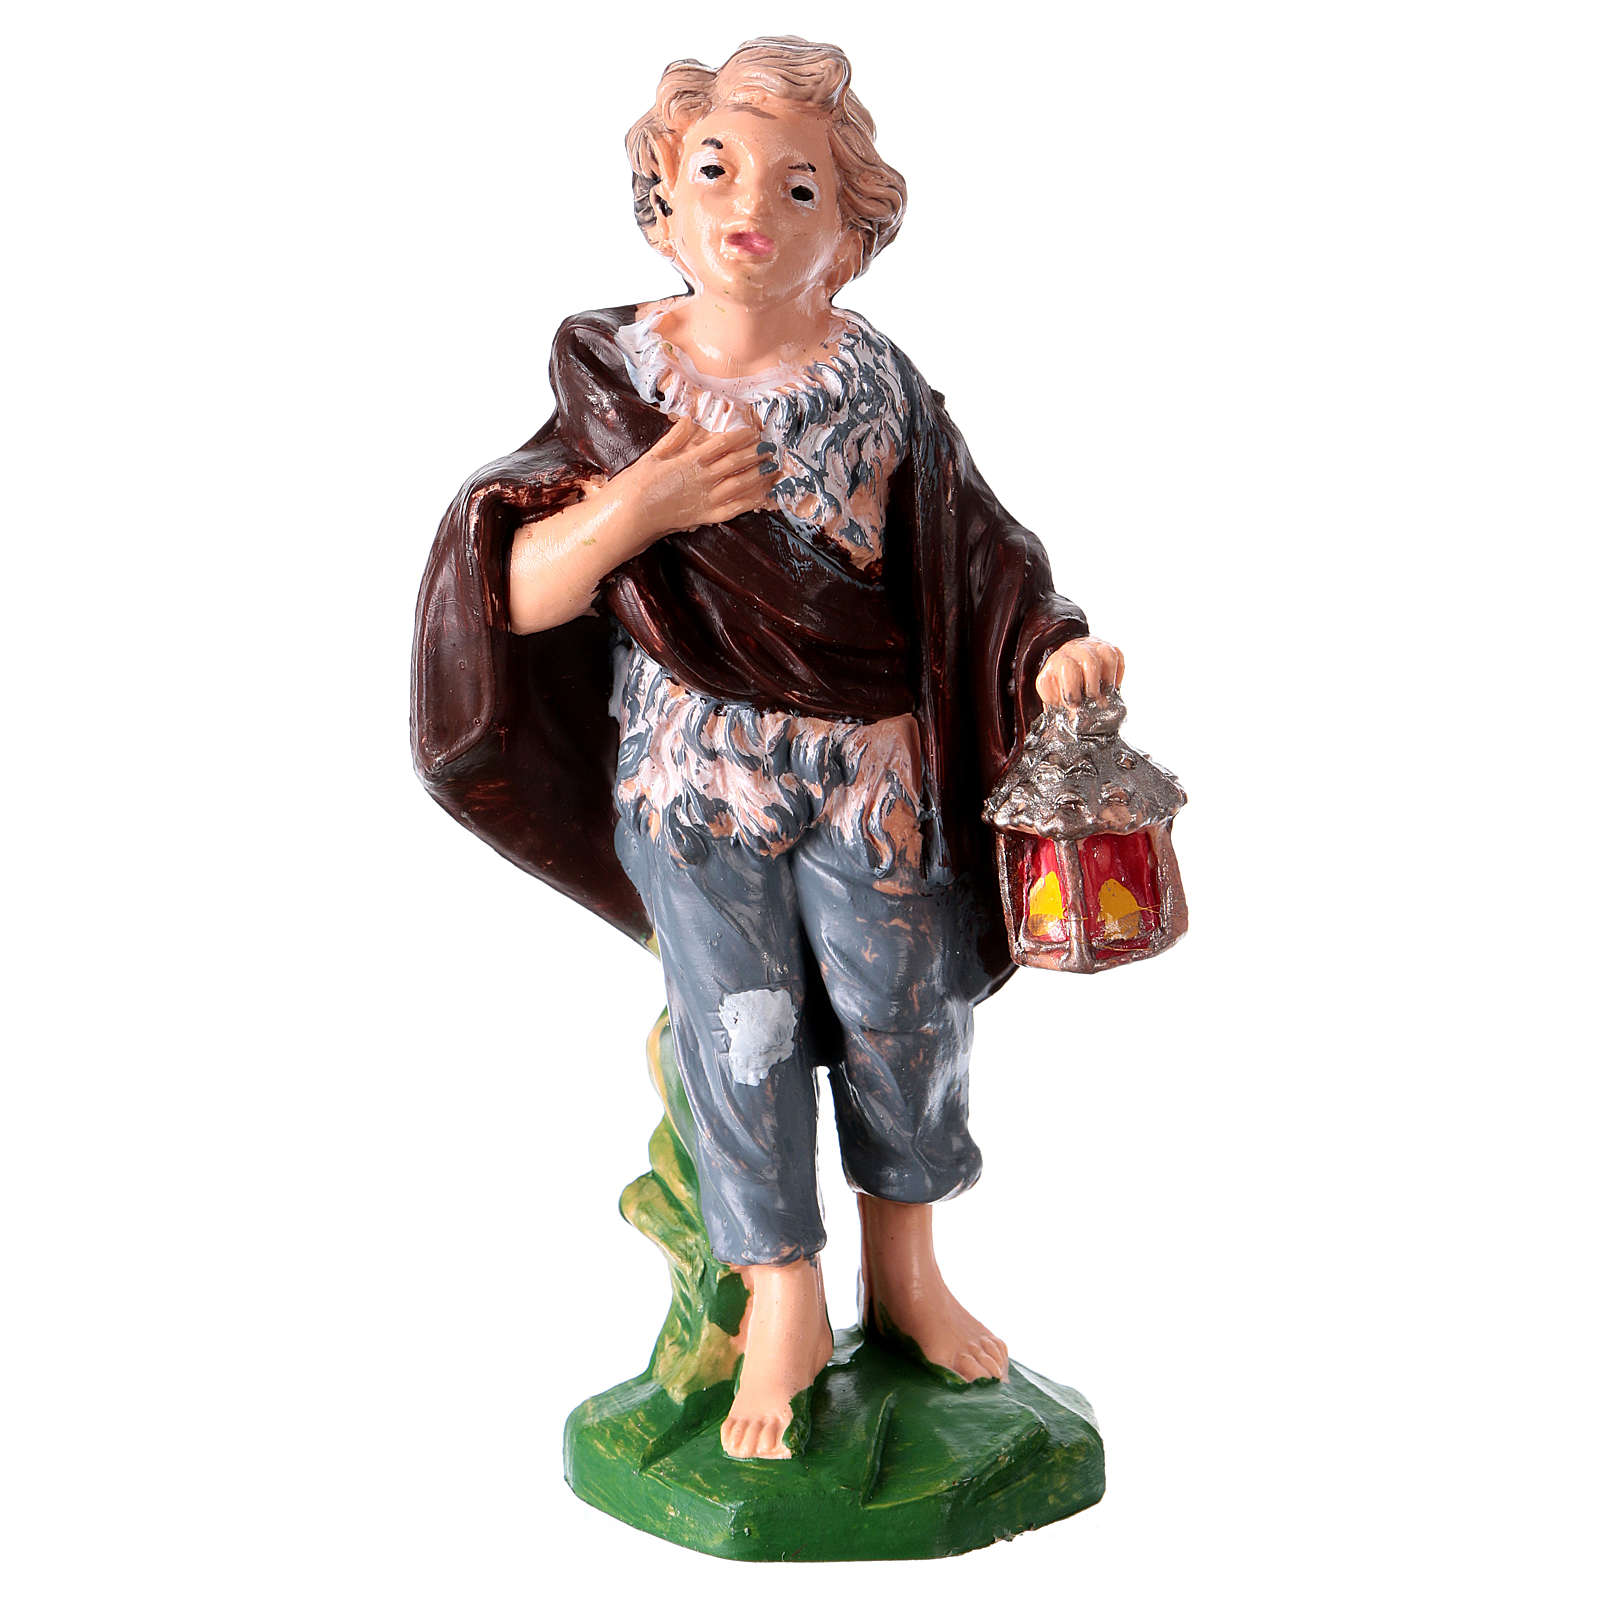 Boy with lantern 10 cm for Nativity Scene 3